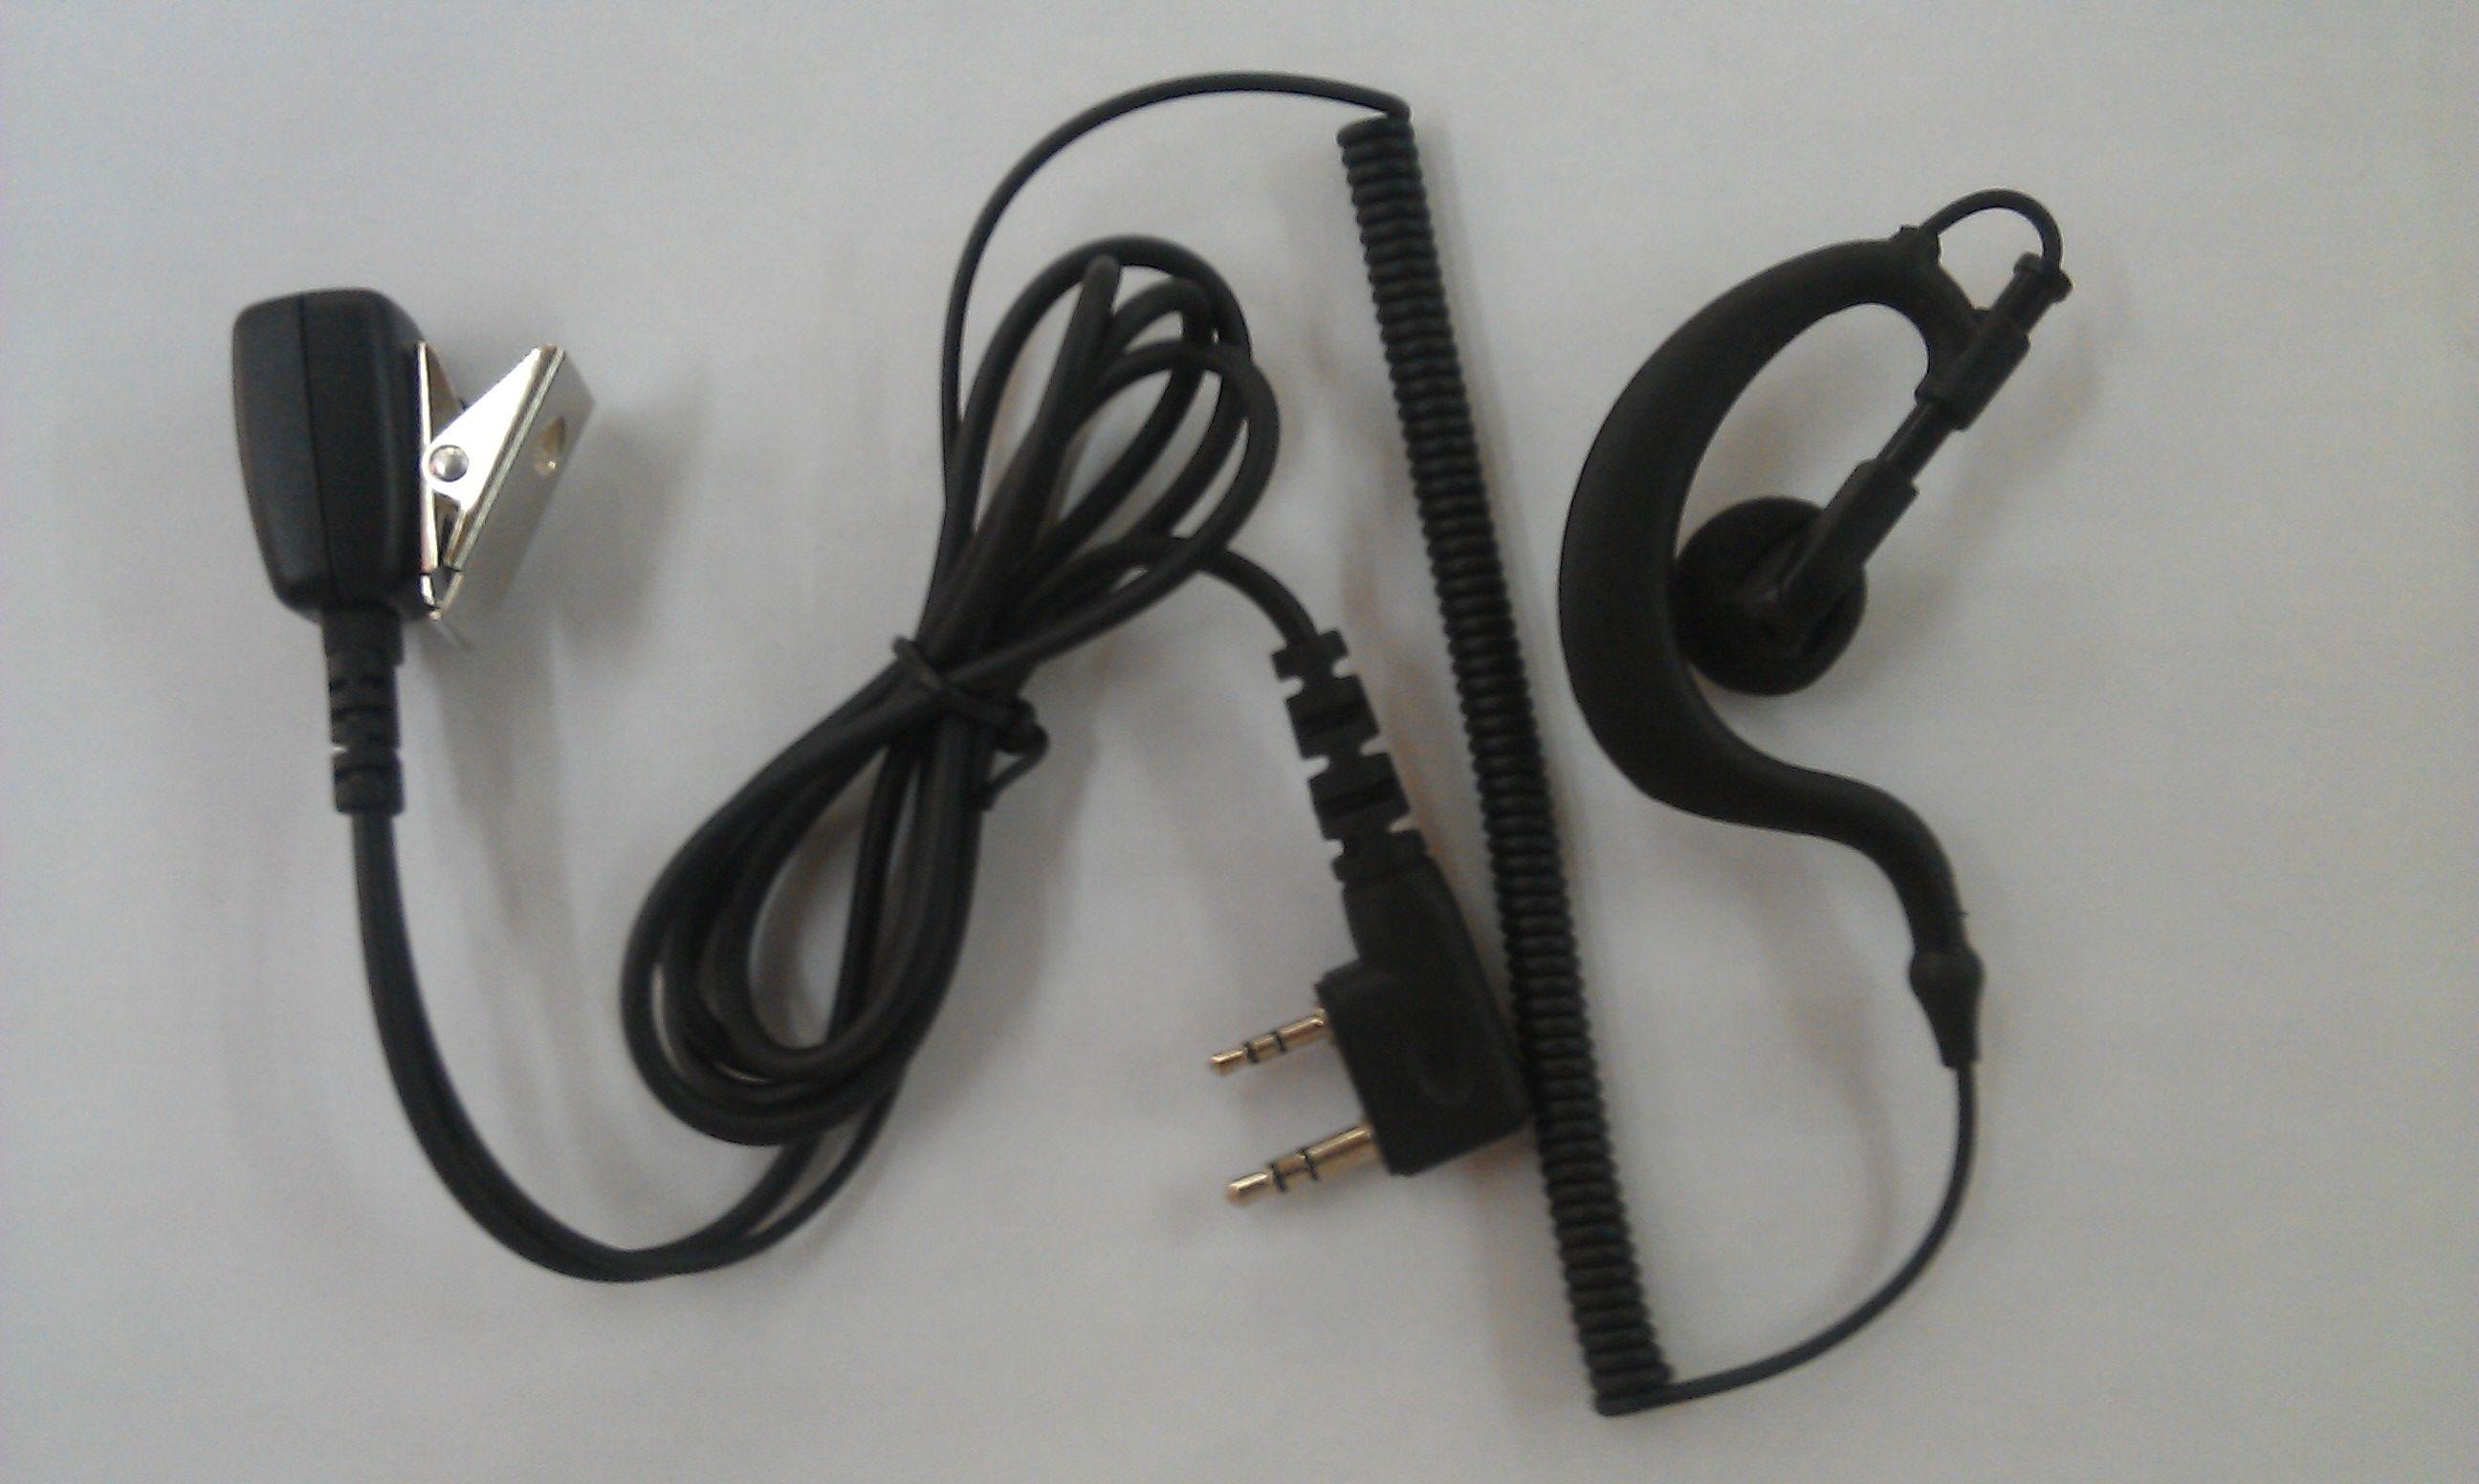 CLASE 3: Catálogo de Olanni Electronics